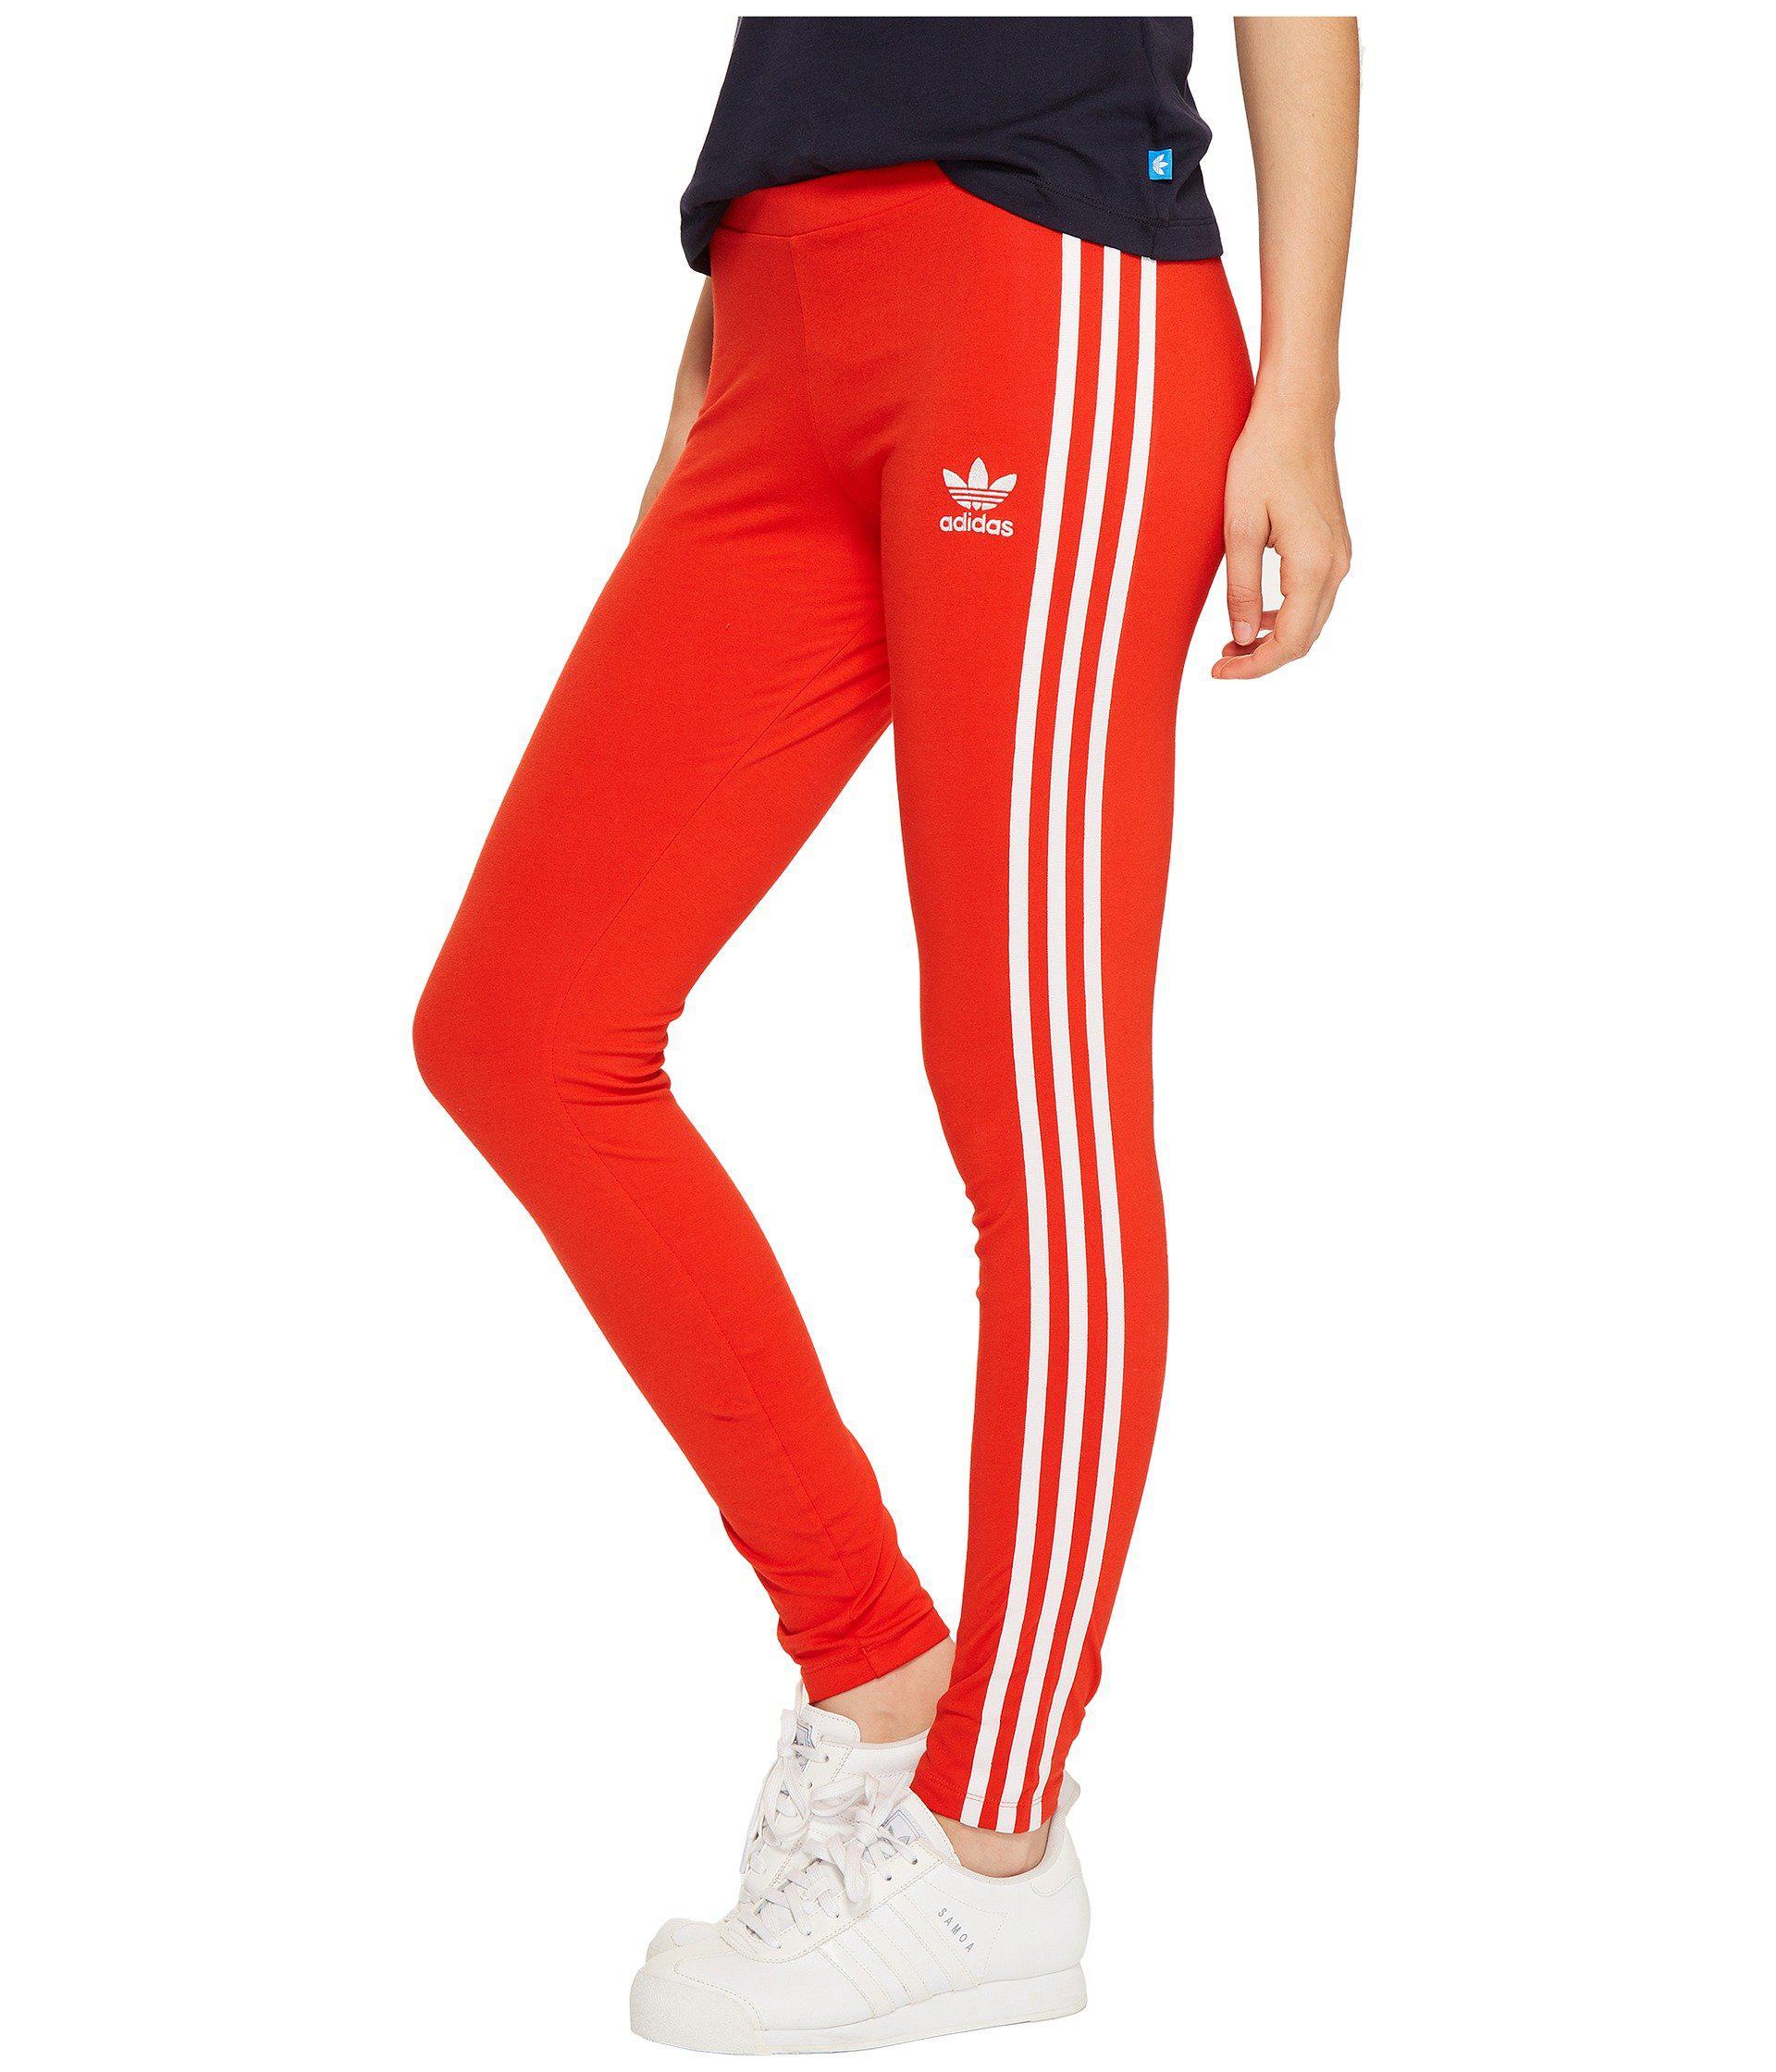 df4b0dab6abed adidas Originals 3-stripes Leggings - London in Red - Lyst